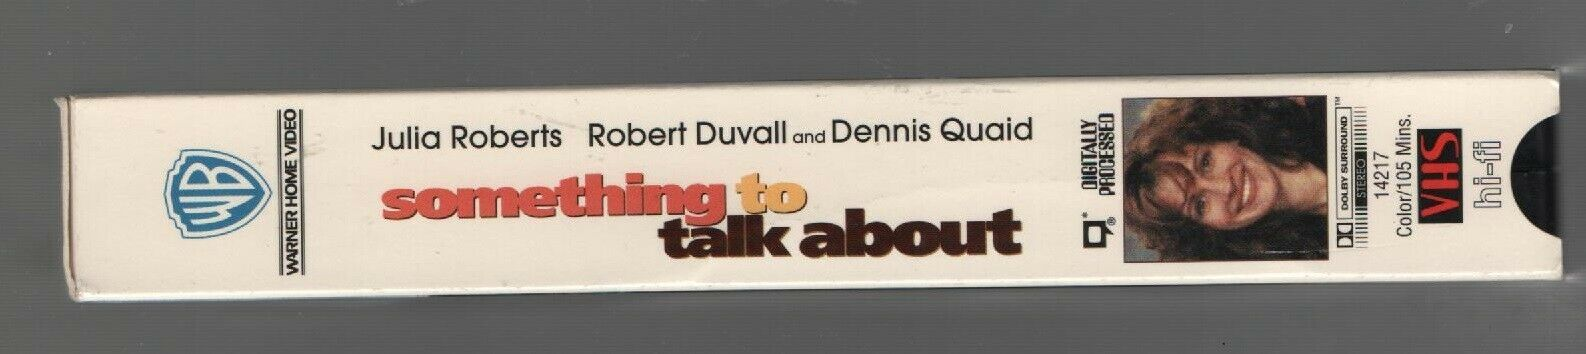 Something to Talk About - Julia Roberts, Robert Duvail - Warner Bros - VHS 14217 image 3